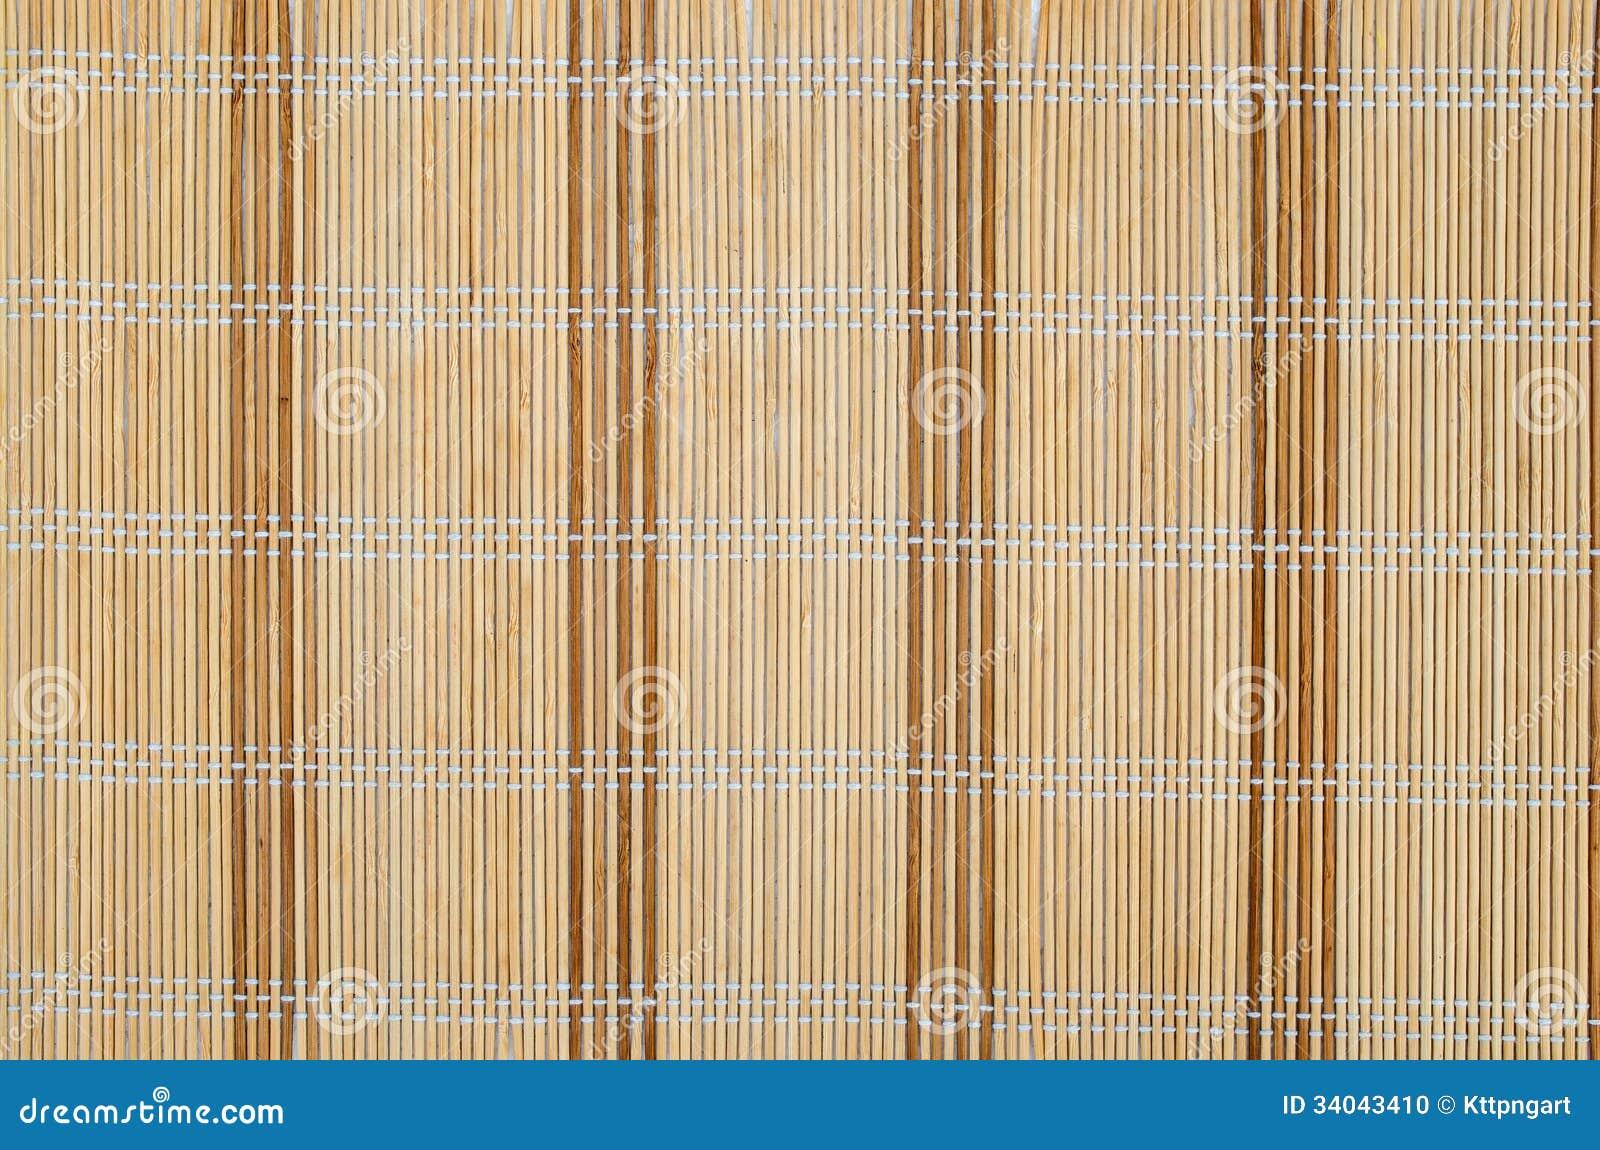 fond en bambou de tapis photo stock image 34043410. Black Bedroom Furniture Sets. Home Design Ideas